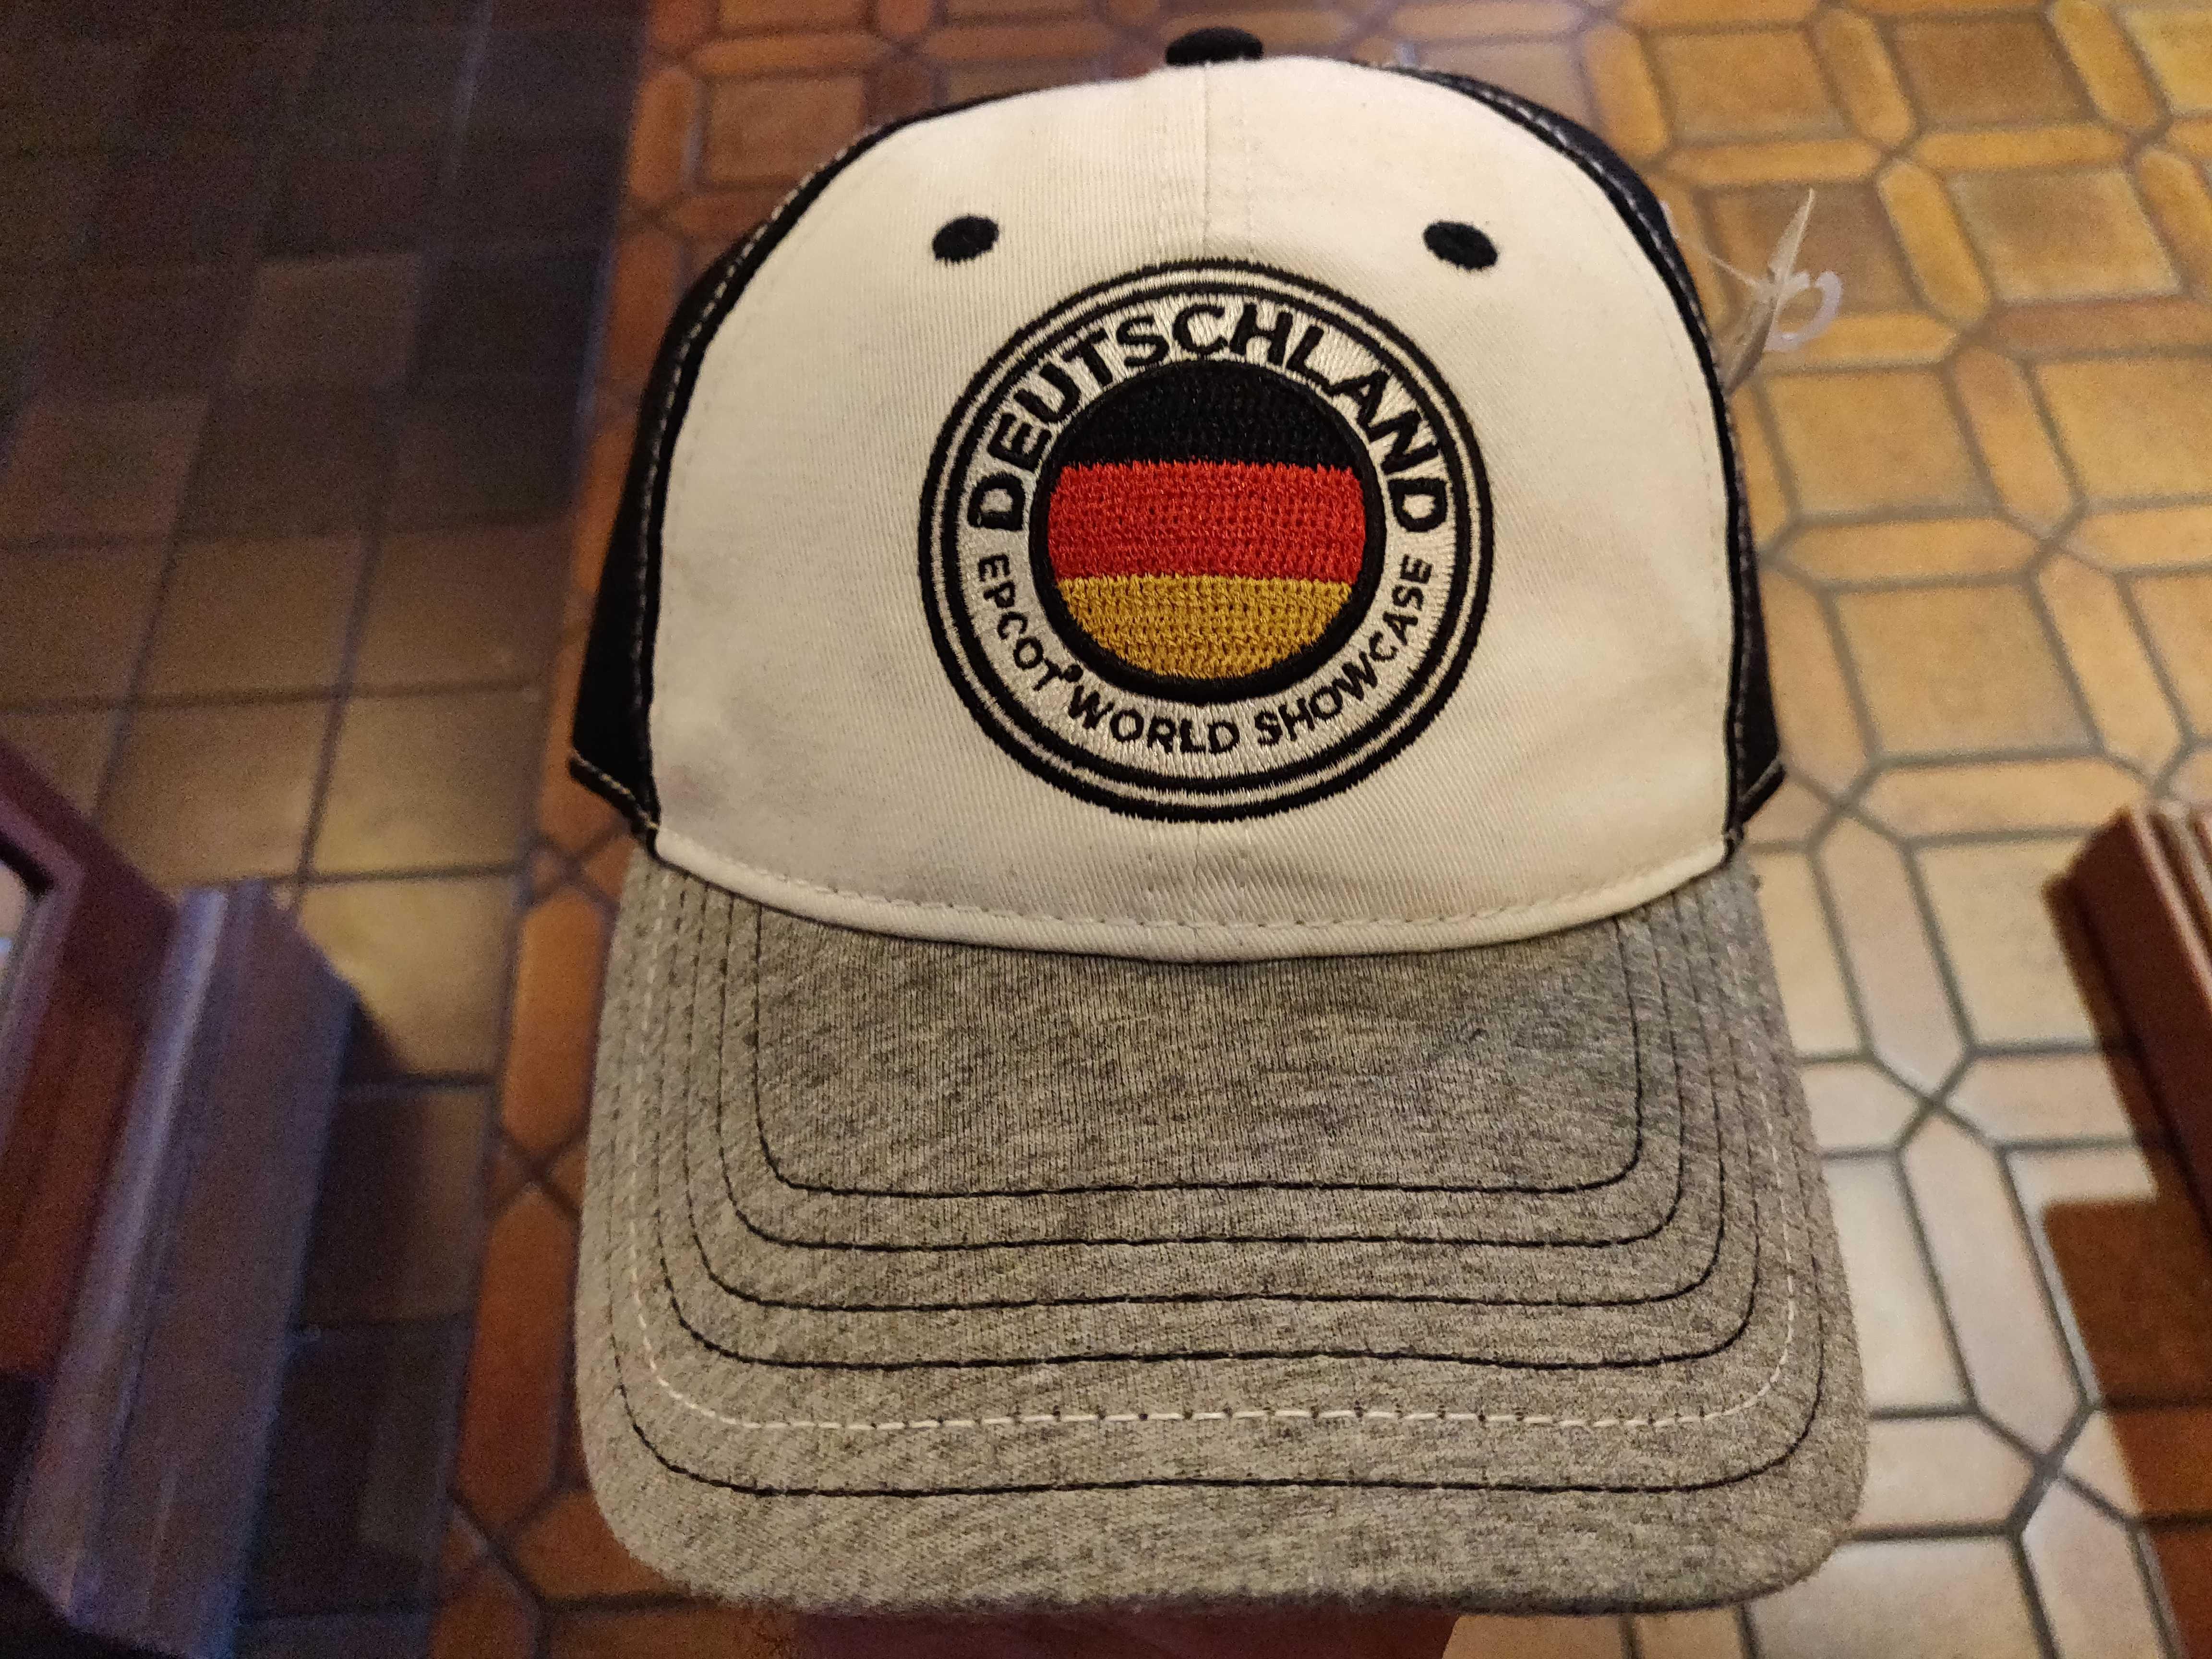 germany-epcot-merchandise-02-15-2020-18.jpg